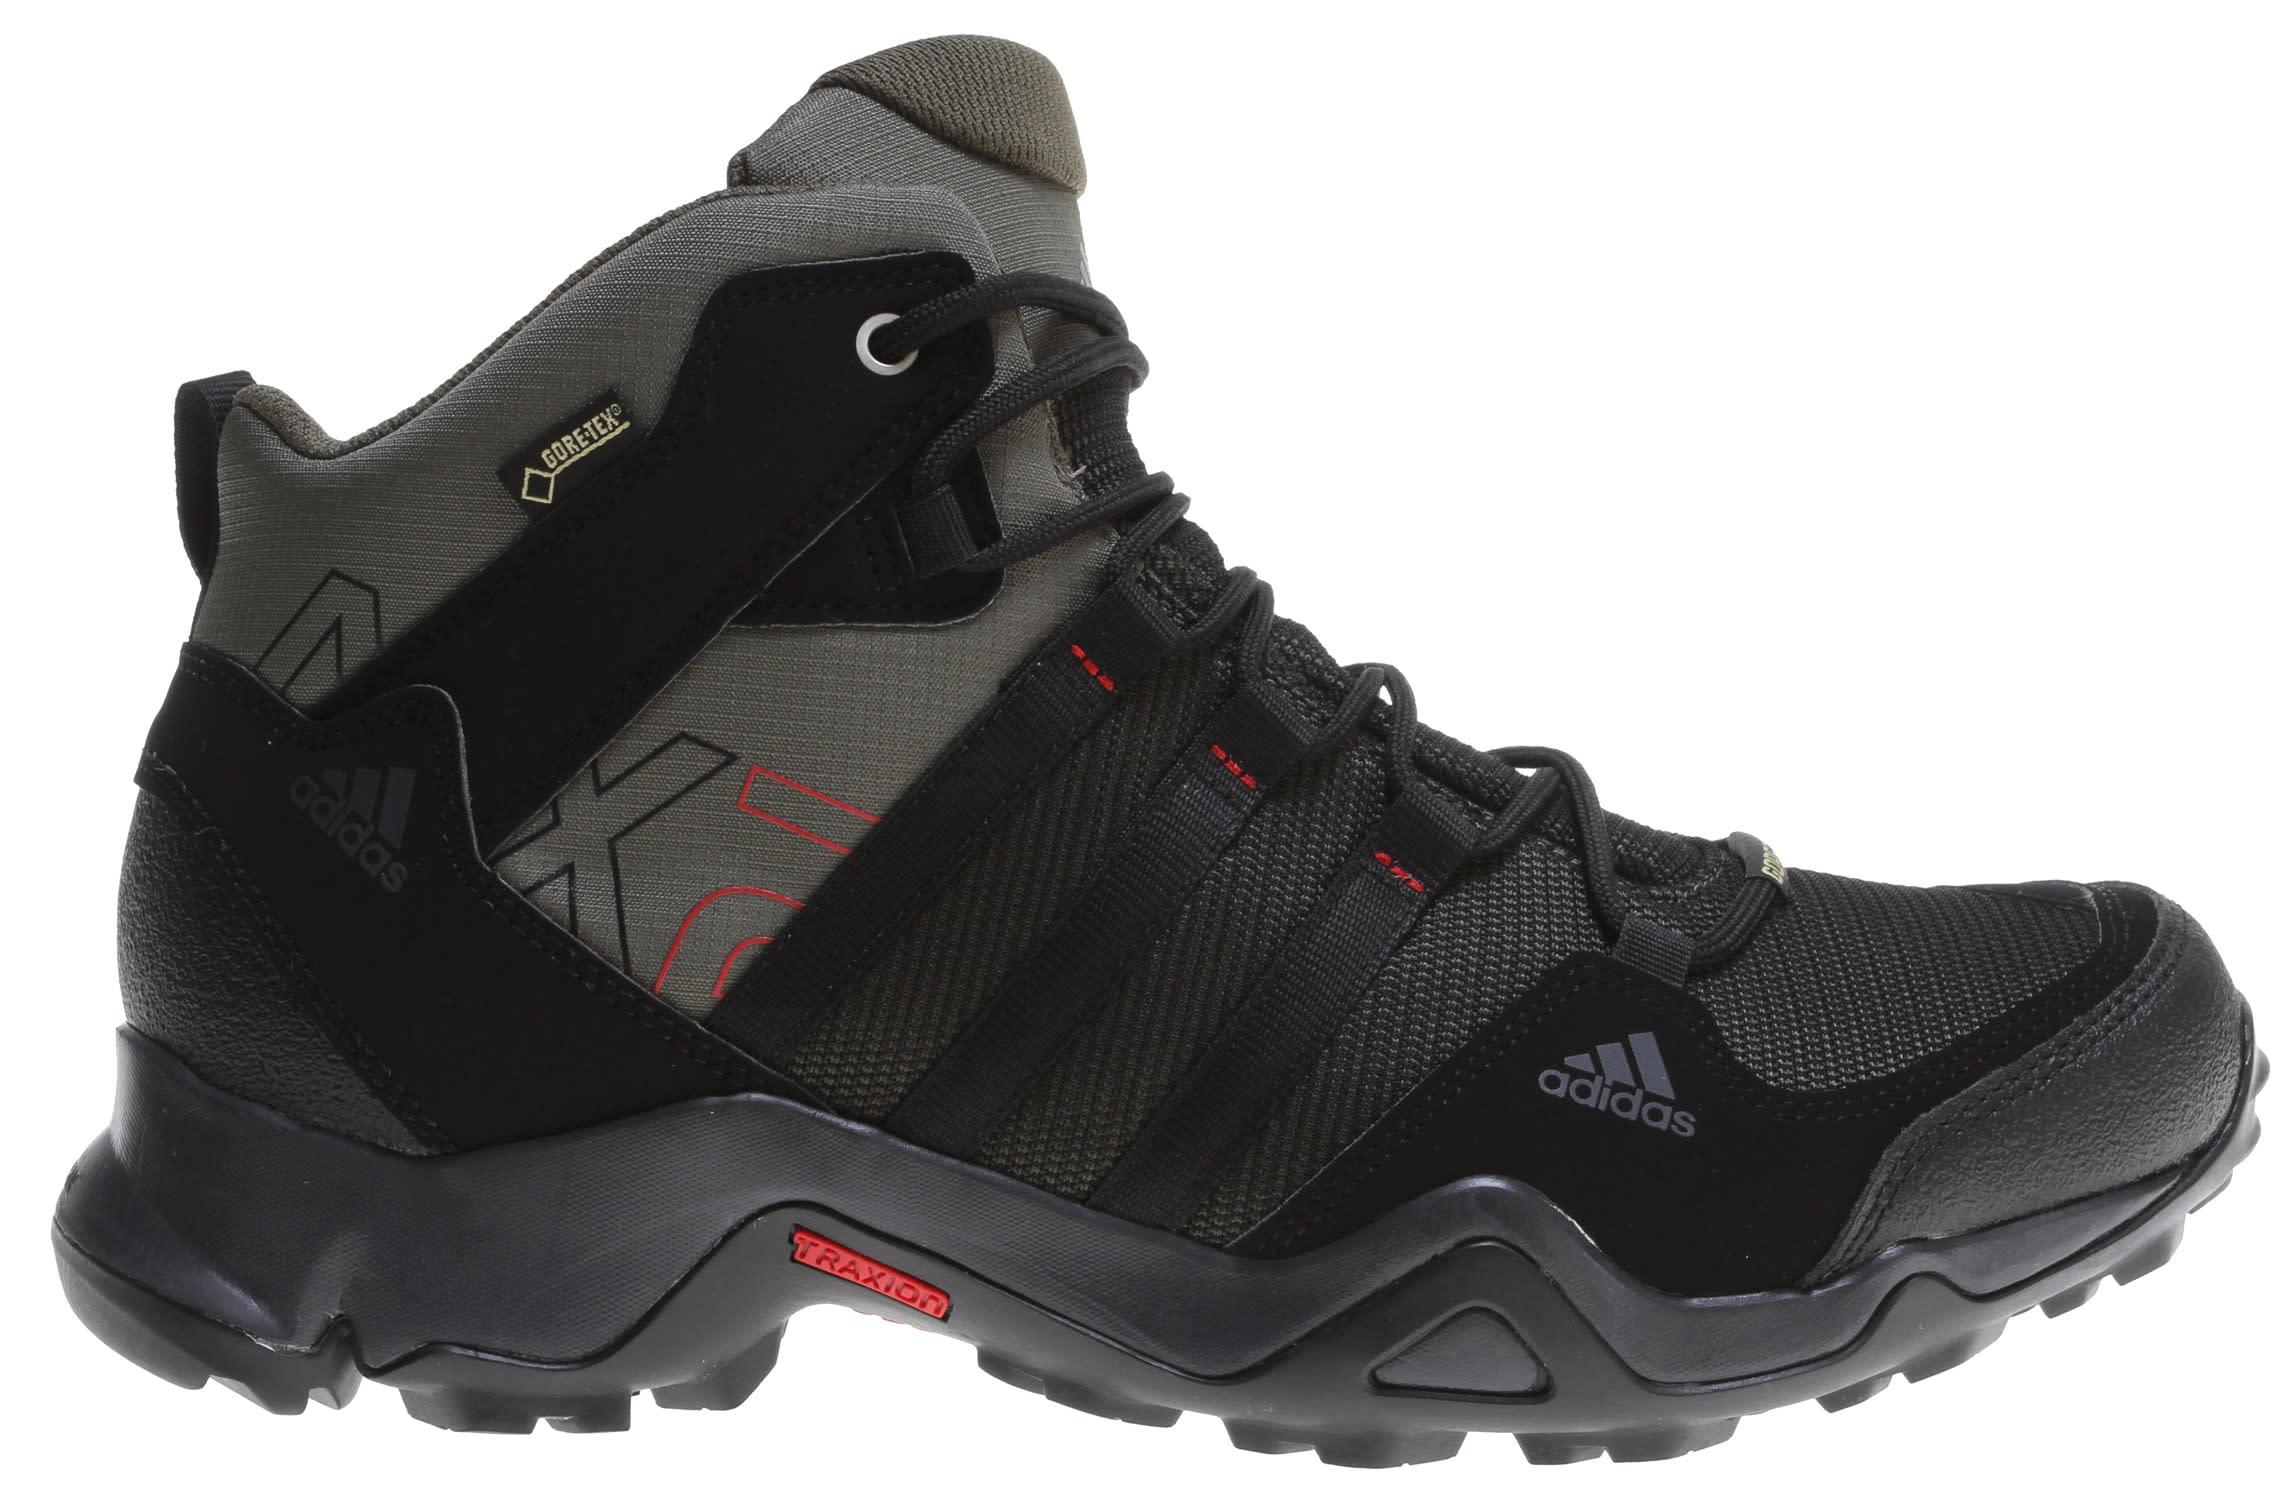 Adidas Ax2 Mid Gore Tex Hiking Boots